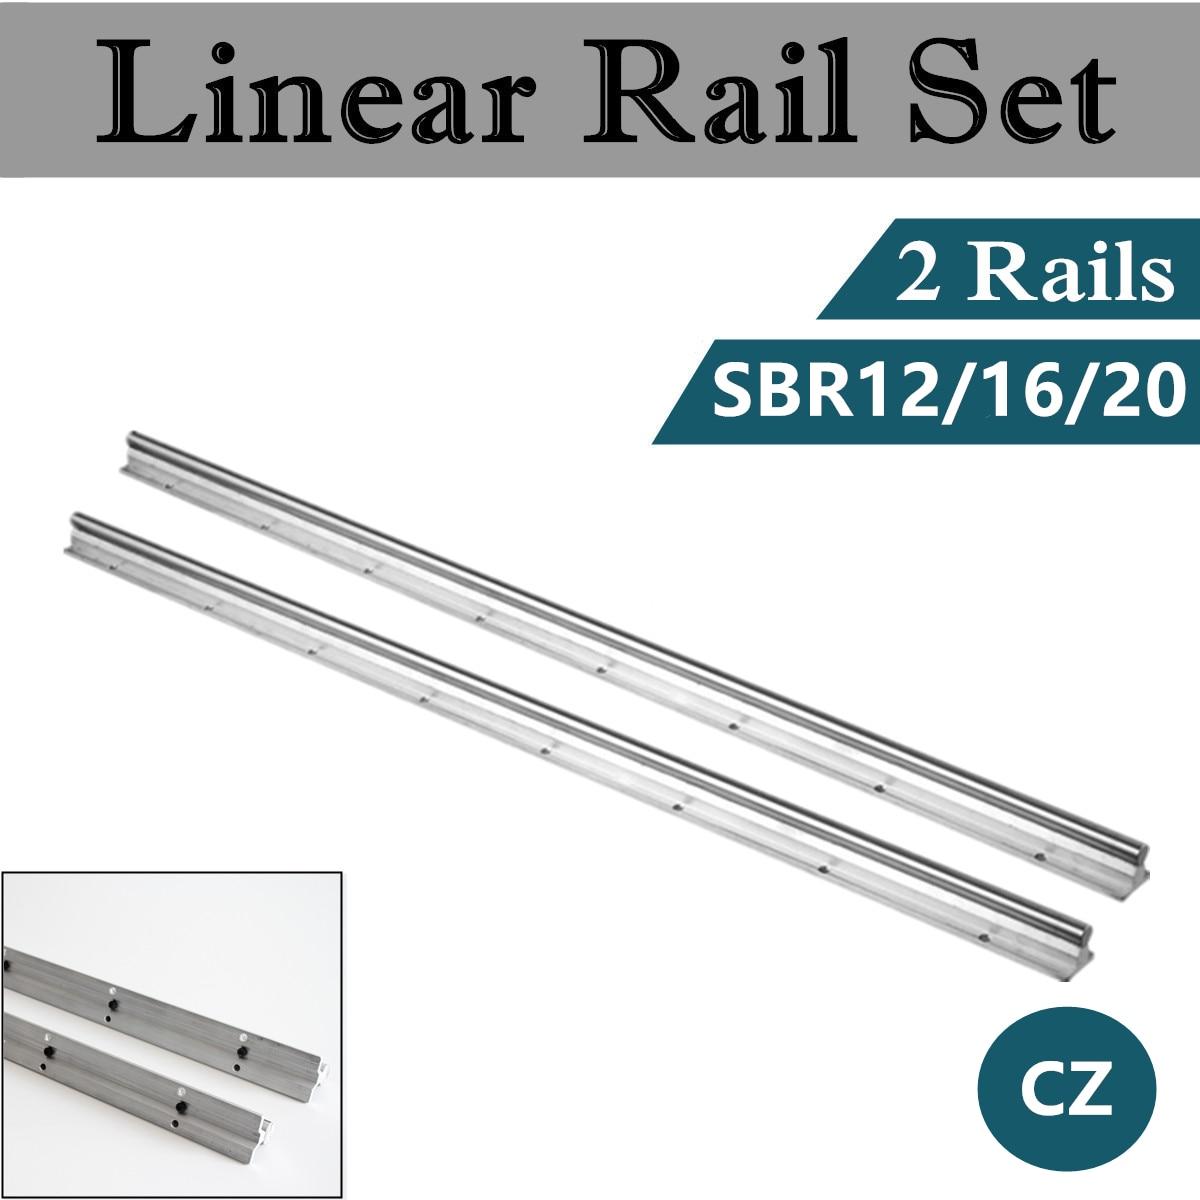 2PC Bearing Linear Supported Rail SBR12 SBR16 SBR20 300/400/500/600/800/1000/1200/1500mm Linear Guide Rail Shaft Rod CNC Rounter